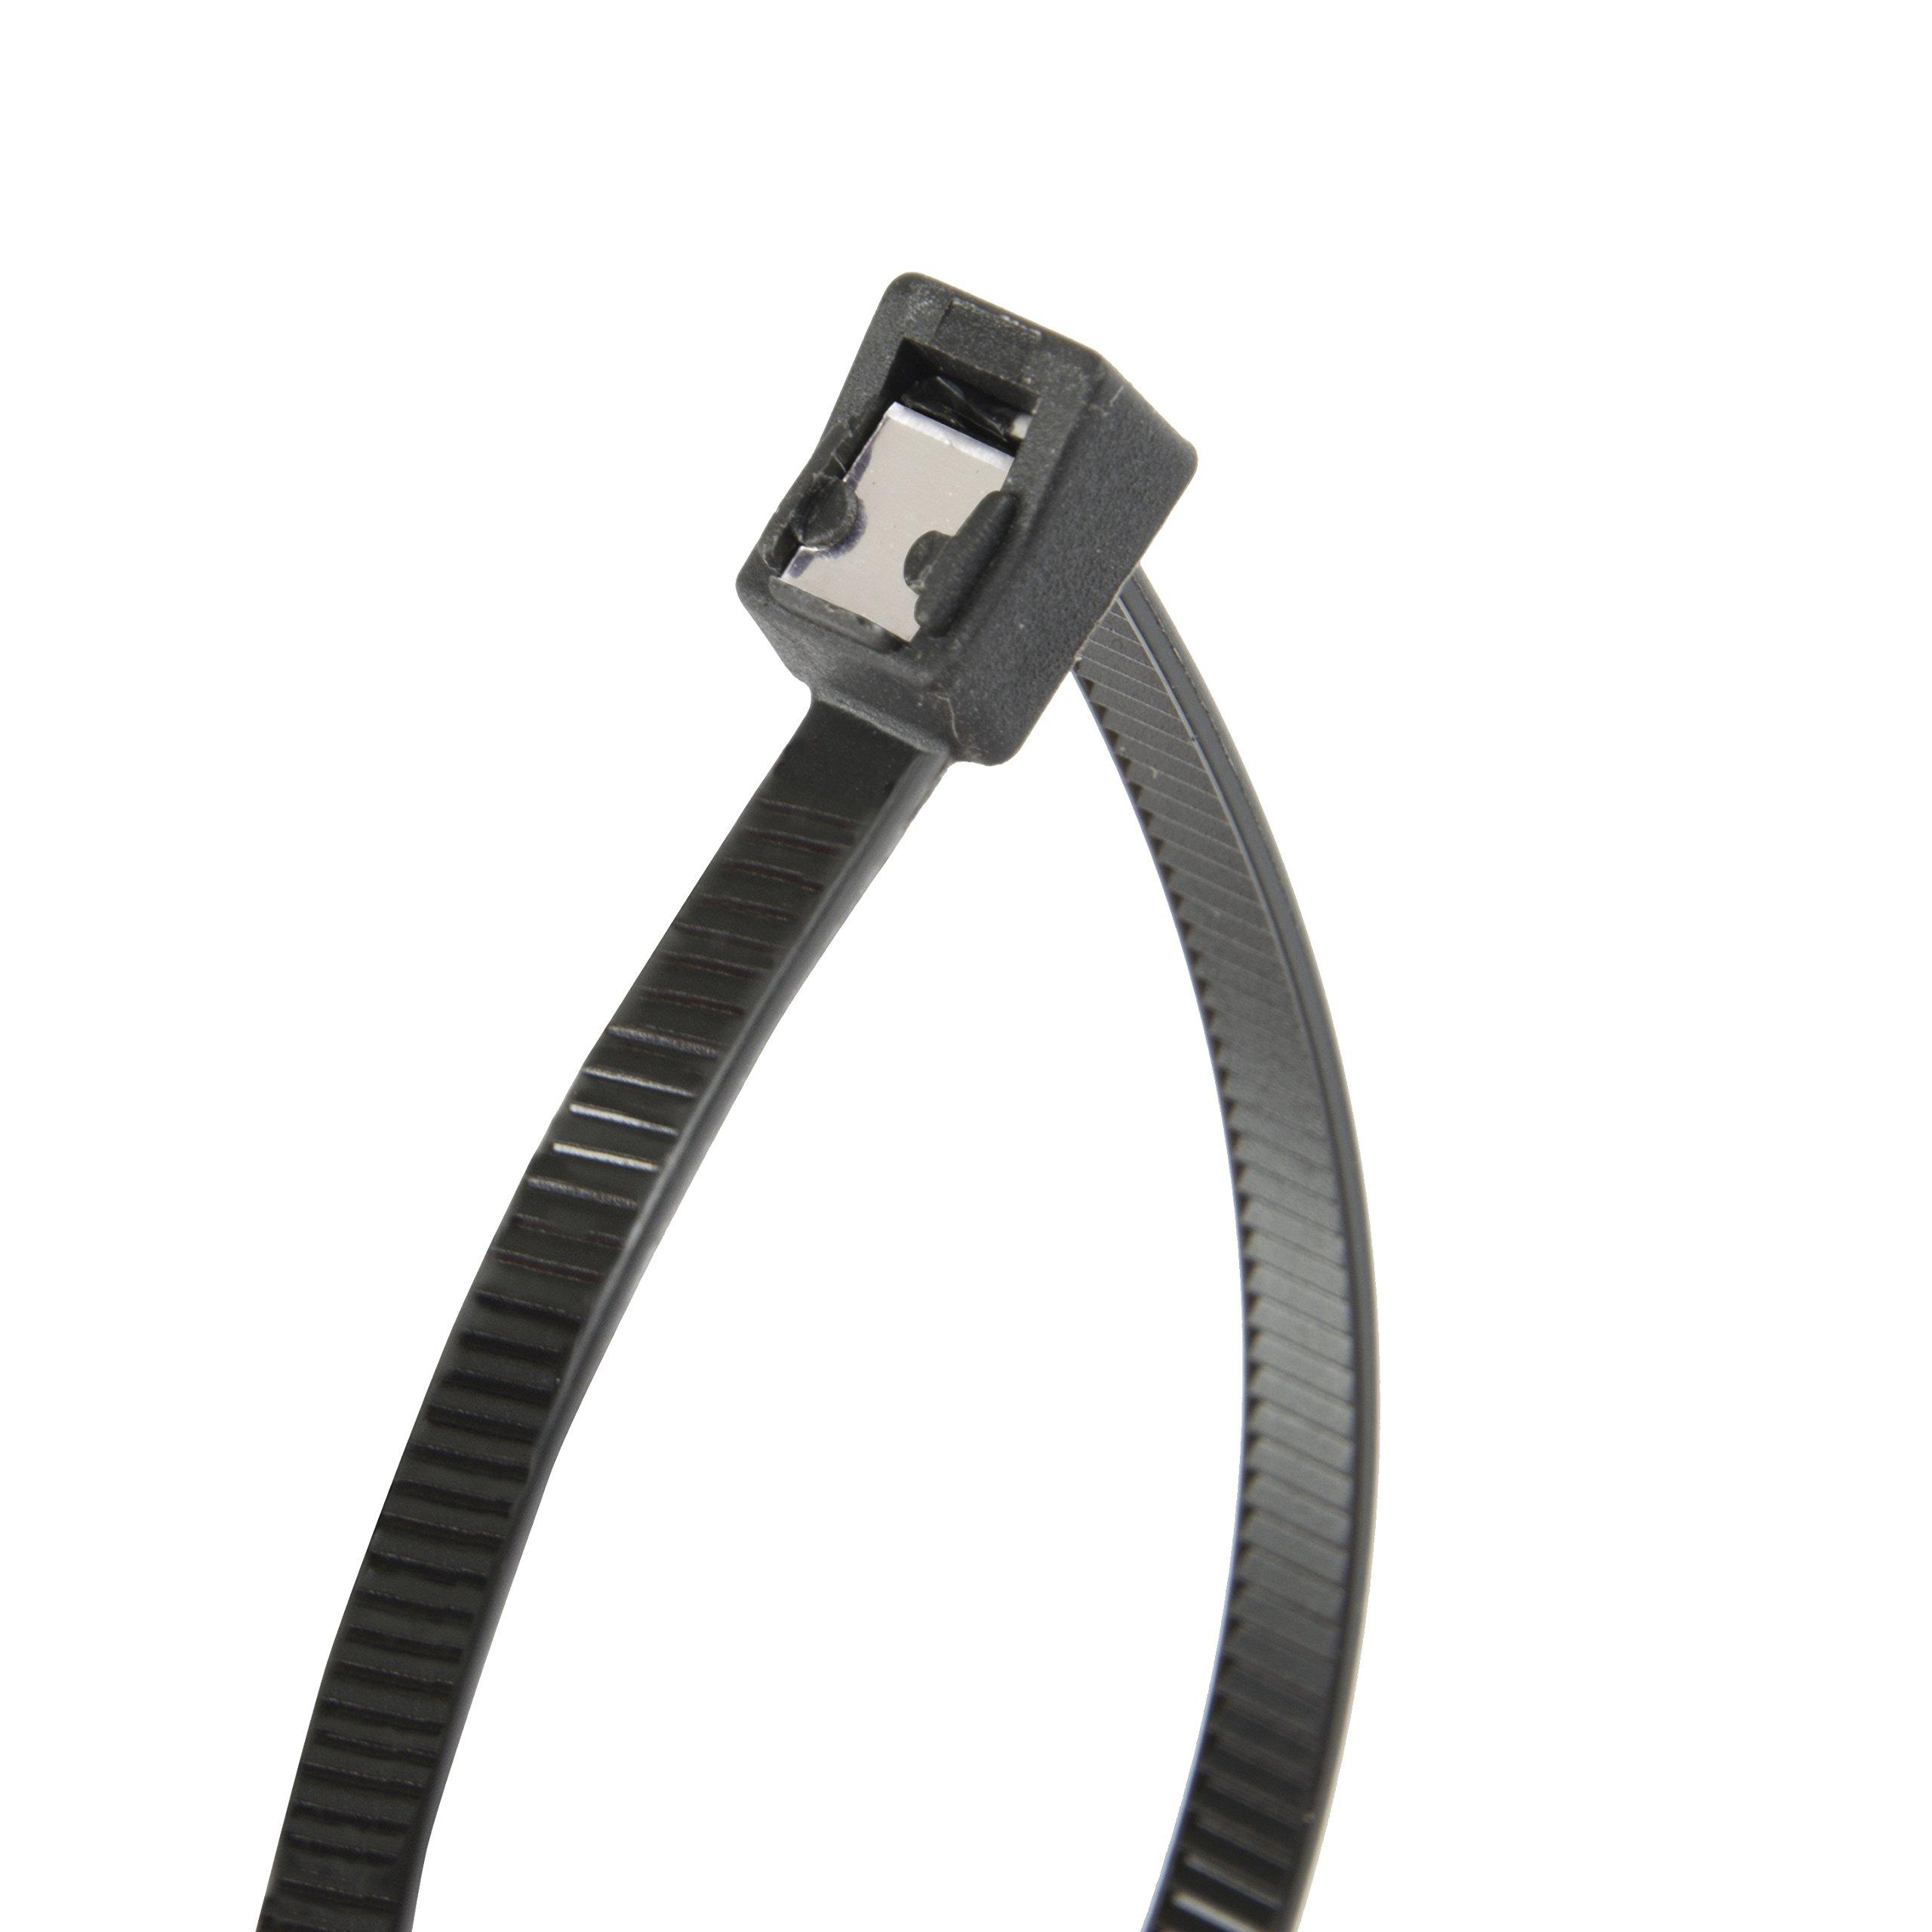 Gardner Bender 46-311UVBSC Nylon Self-Cutting Cable Tie, 11 inch, 50 lb. Tensile, Twist-Off Tail, Zip Tie, 50 Pk, UV Resistant Black